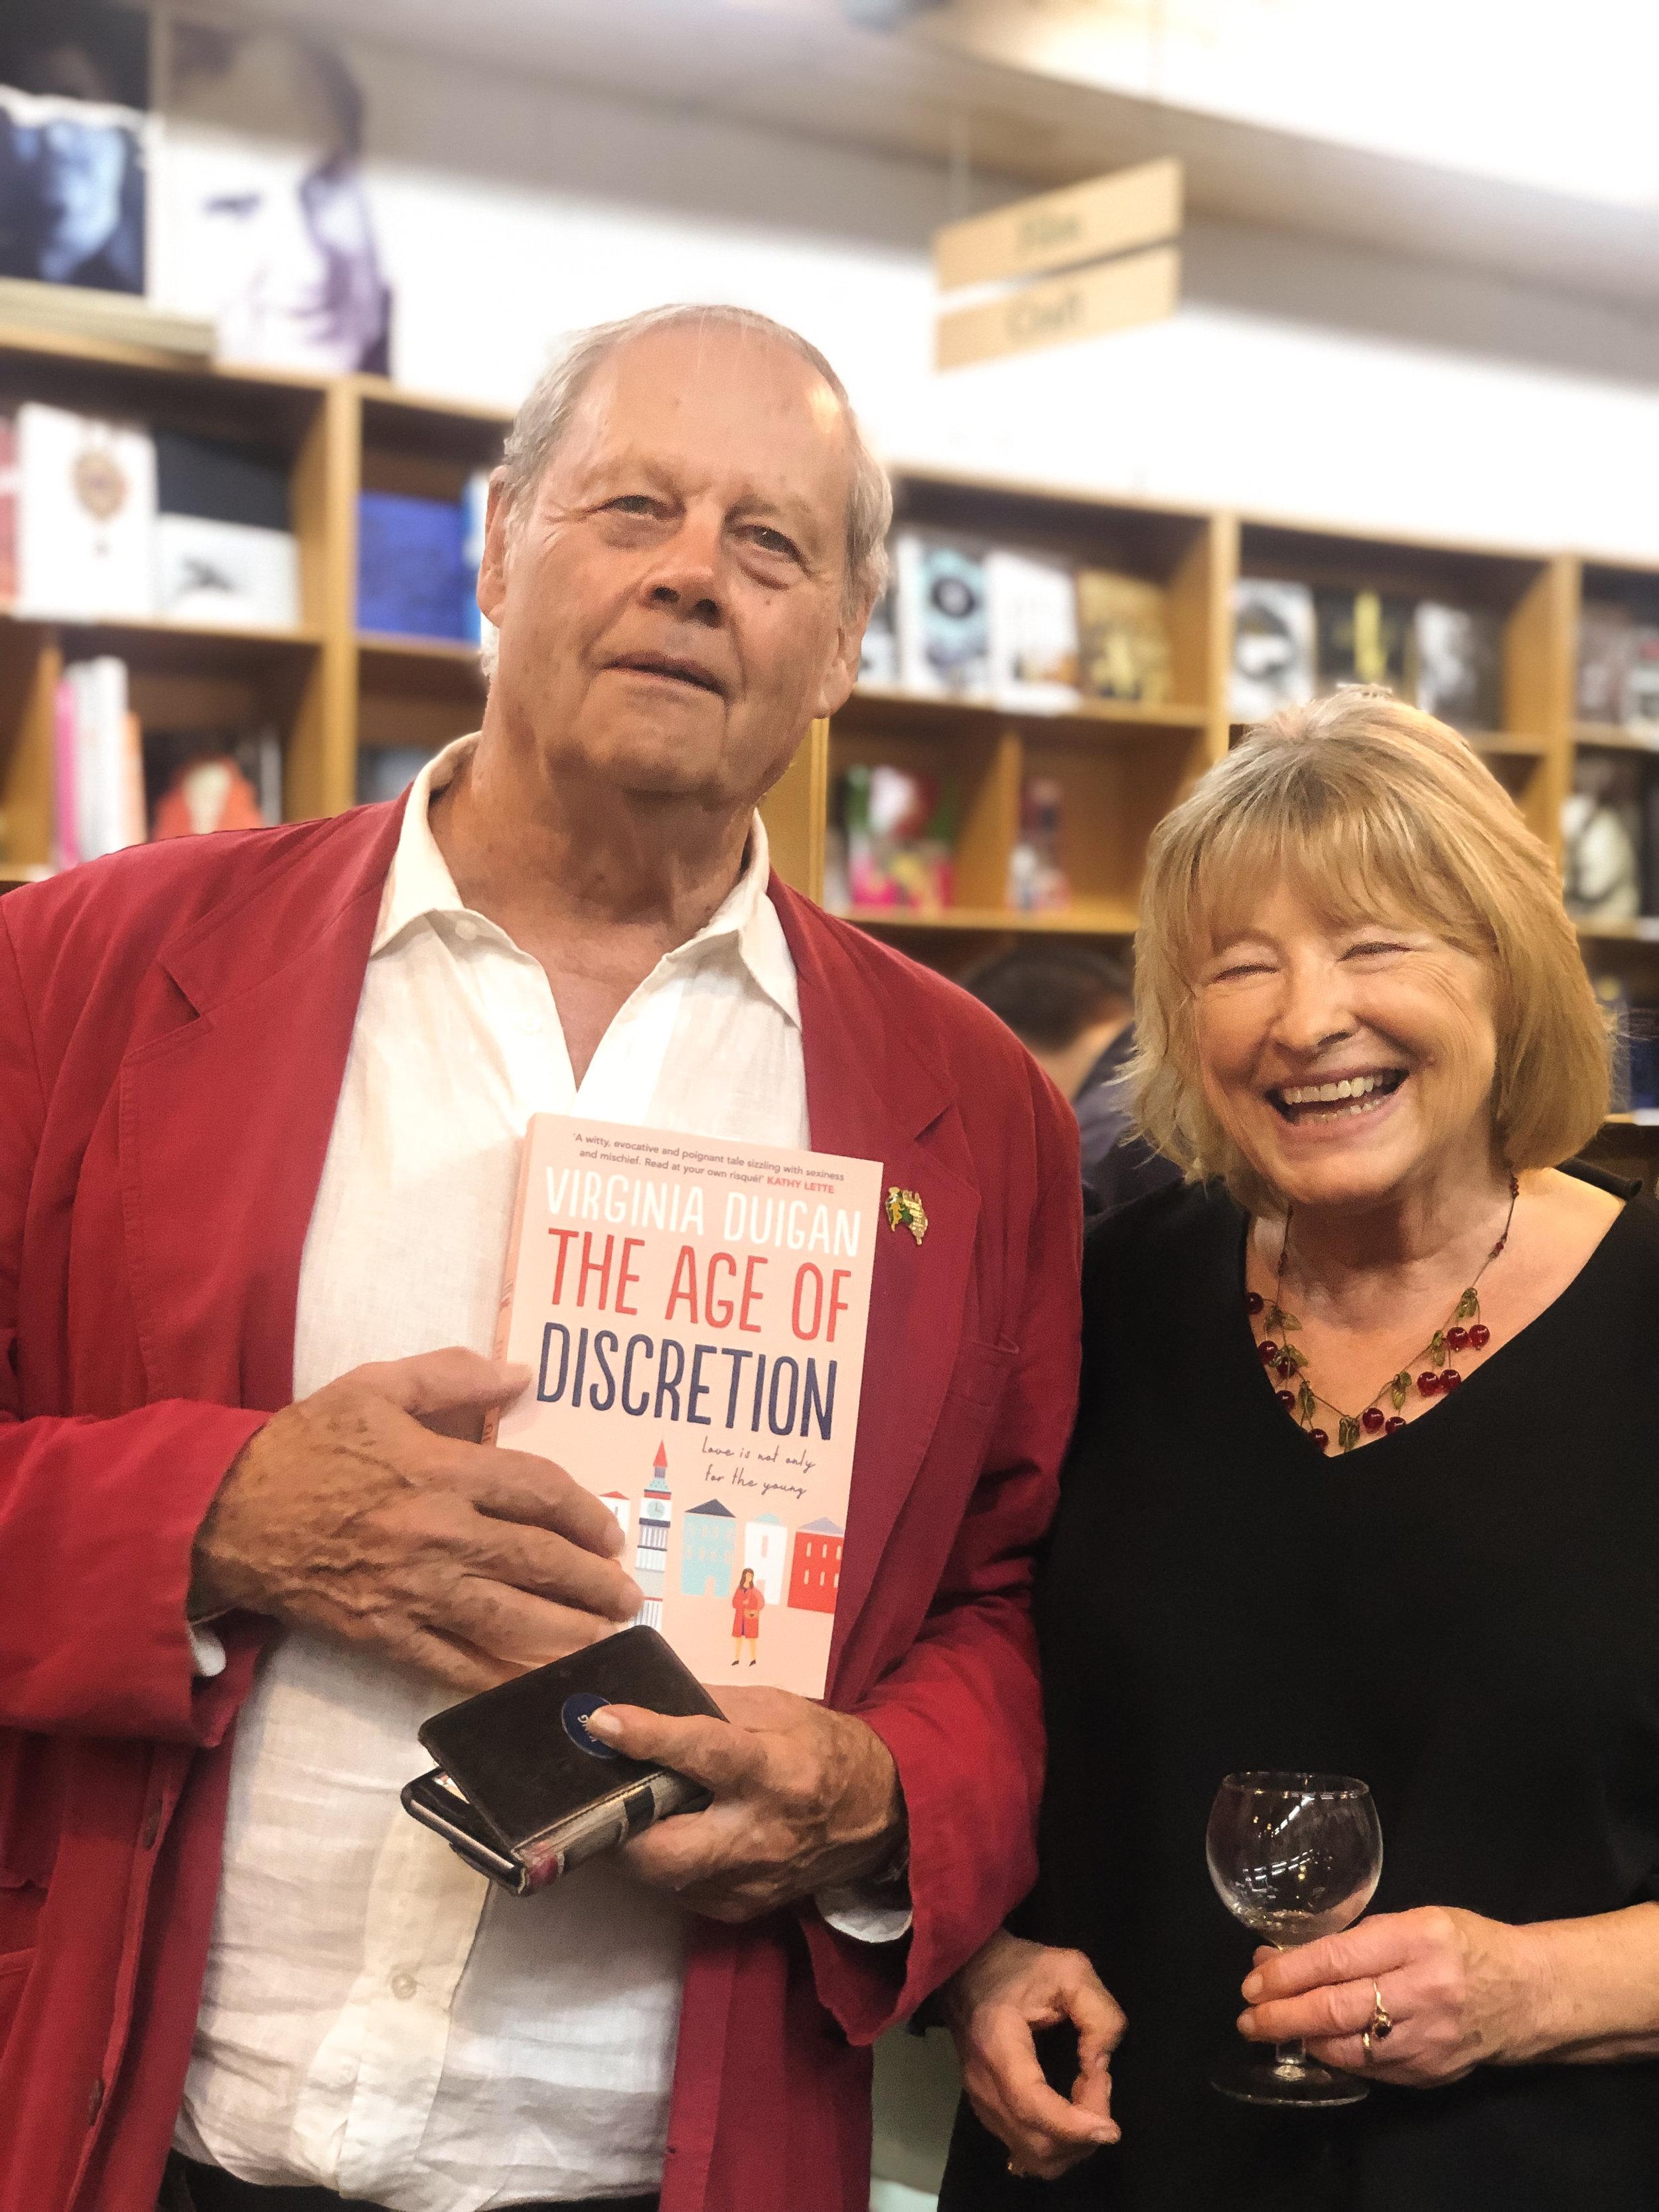 Bruce Beresford and Virginia Duigan